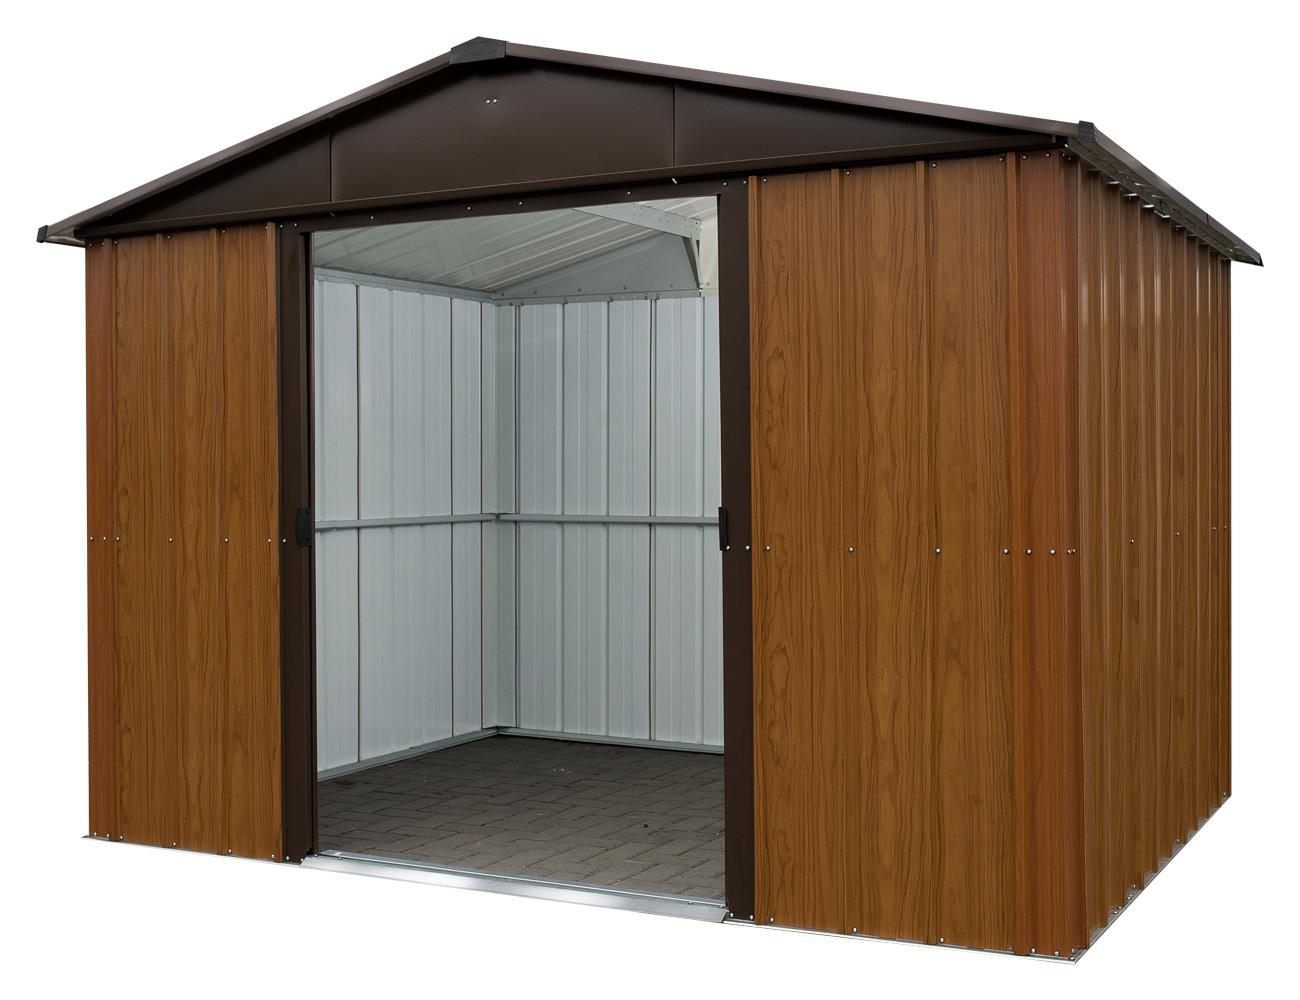 Abri de jardin métal Yardmaster aspect bois 12 m²